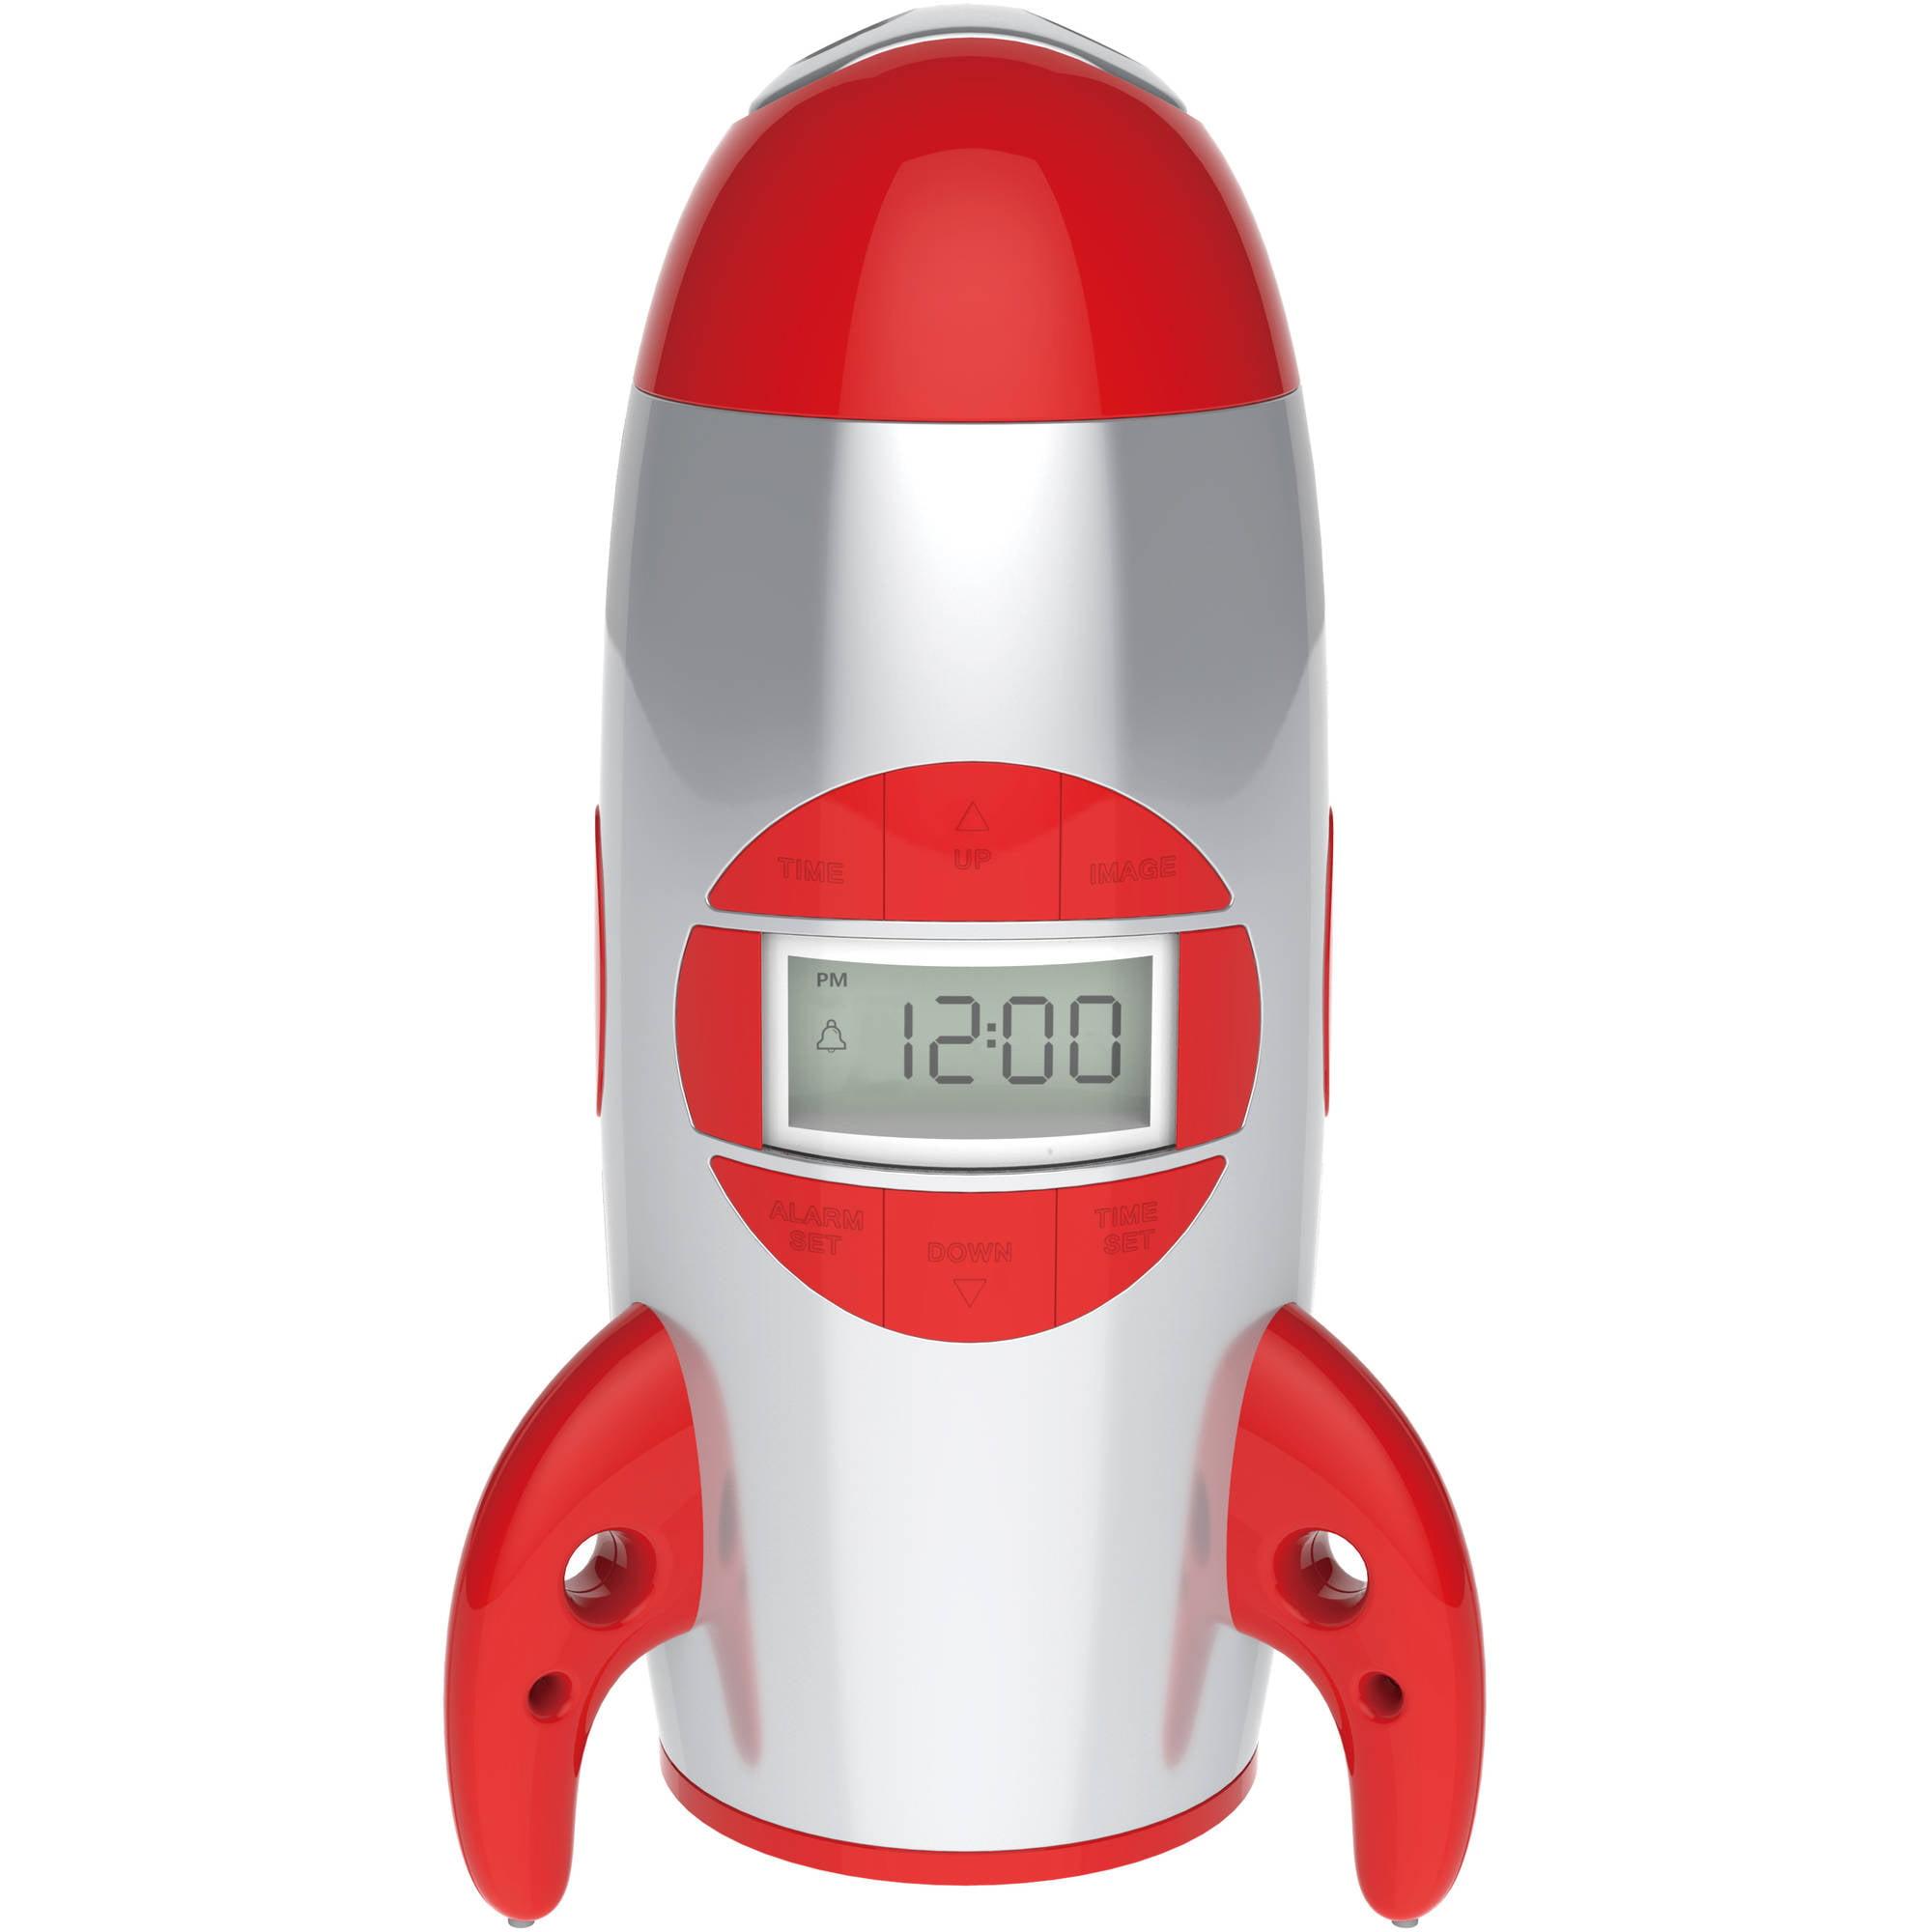 Rocket Ship Projection Alarm Clock